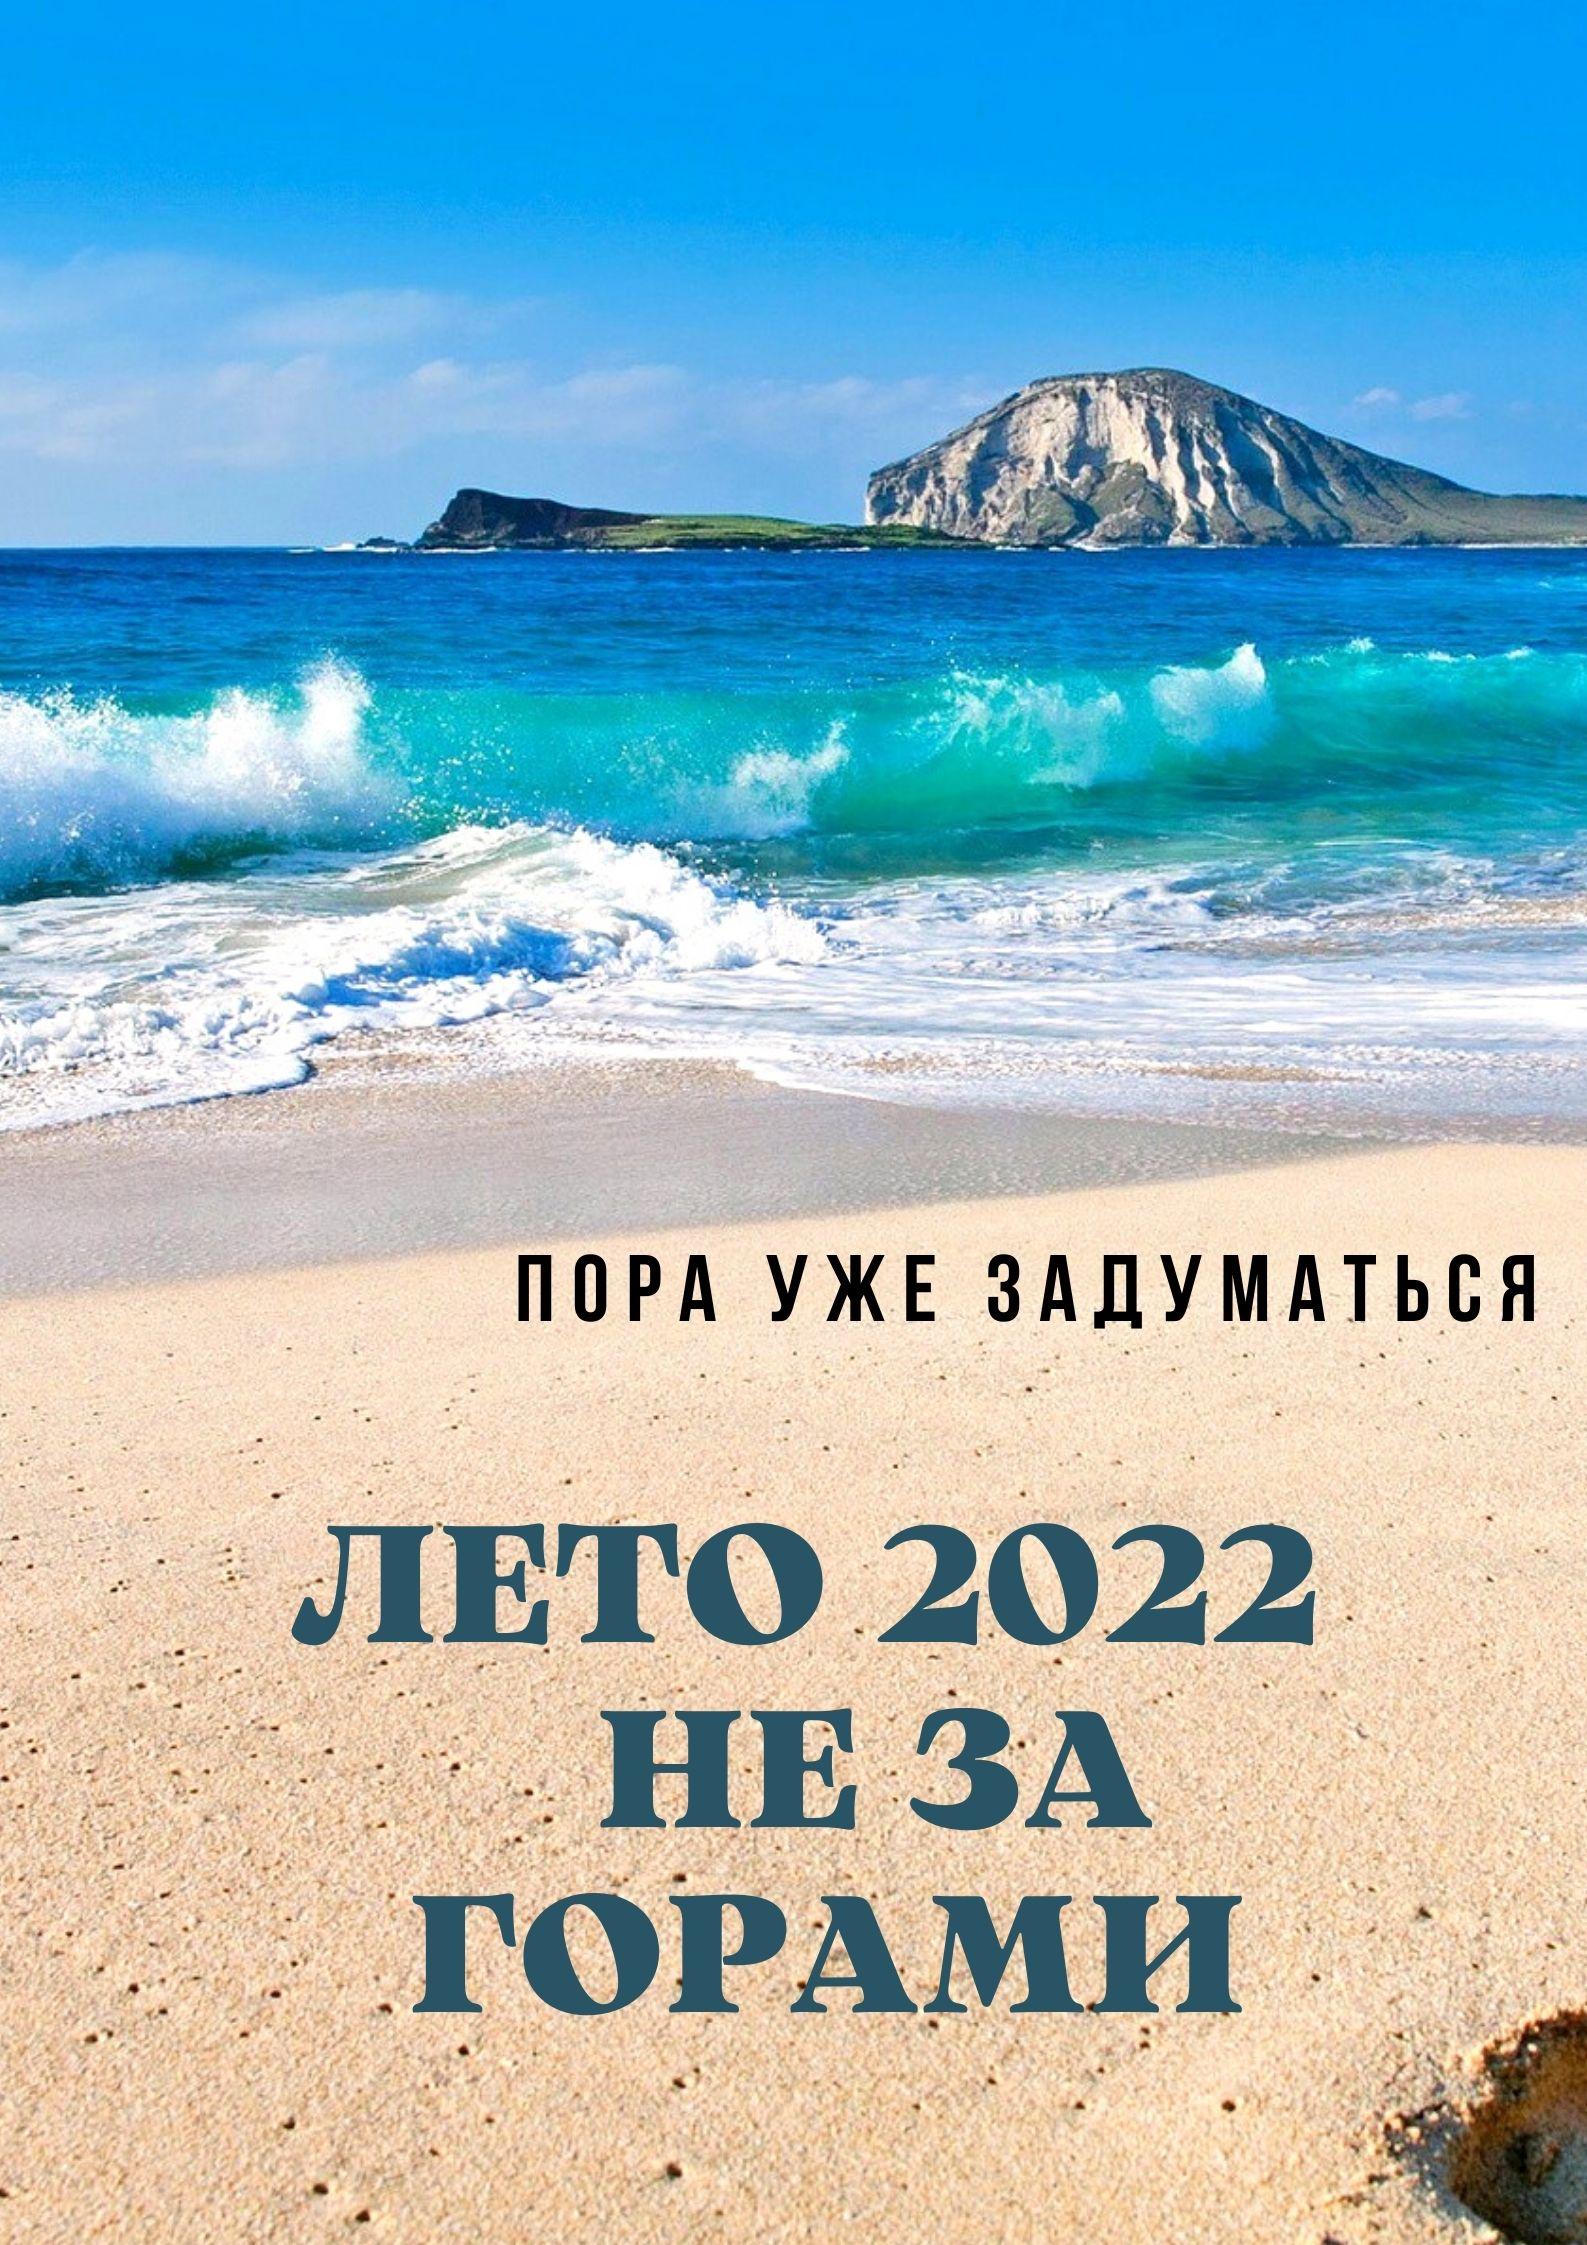 Отдых на море все включено, лето   2022 по России, Сочи, Анапа, Подмосковье